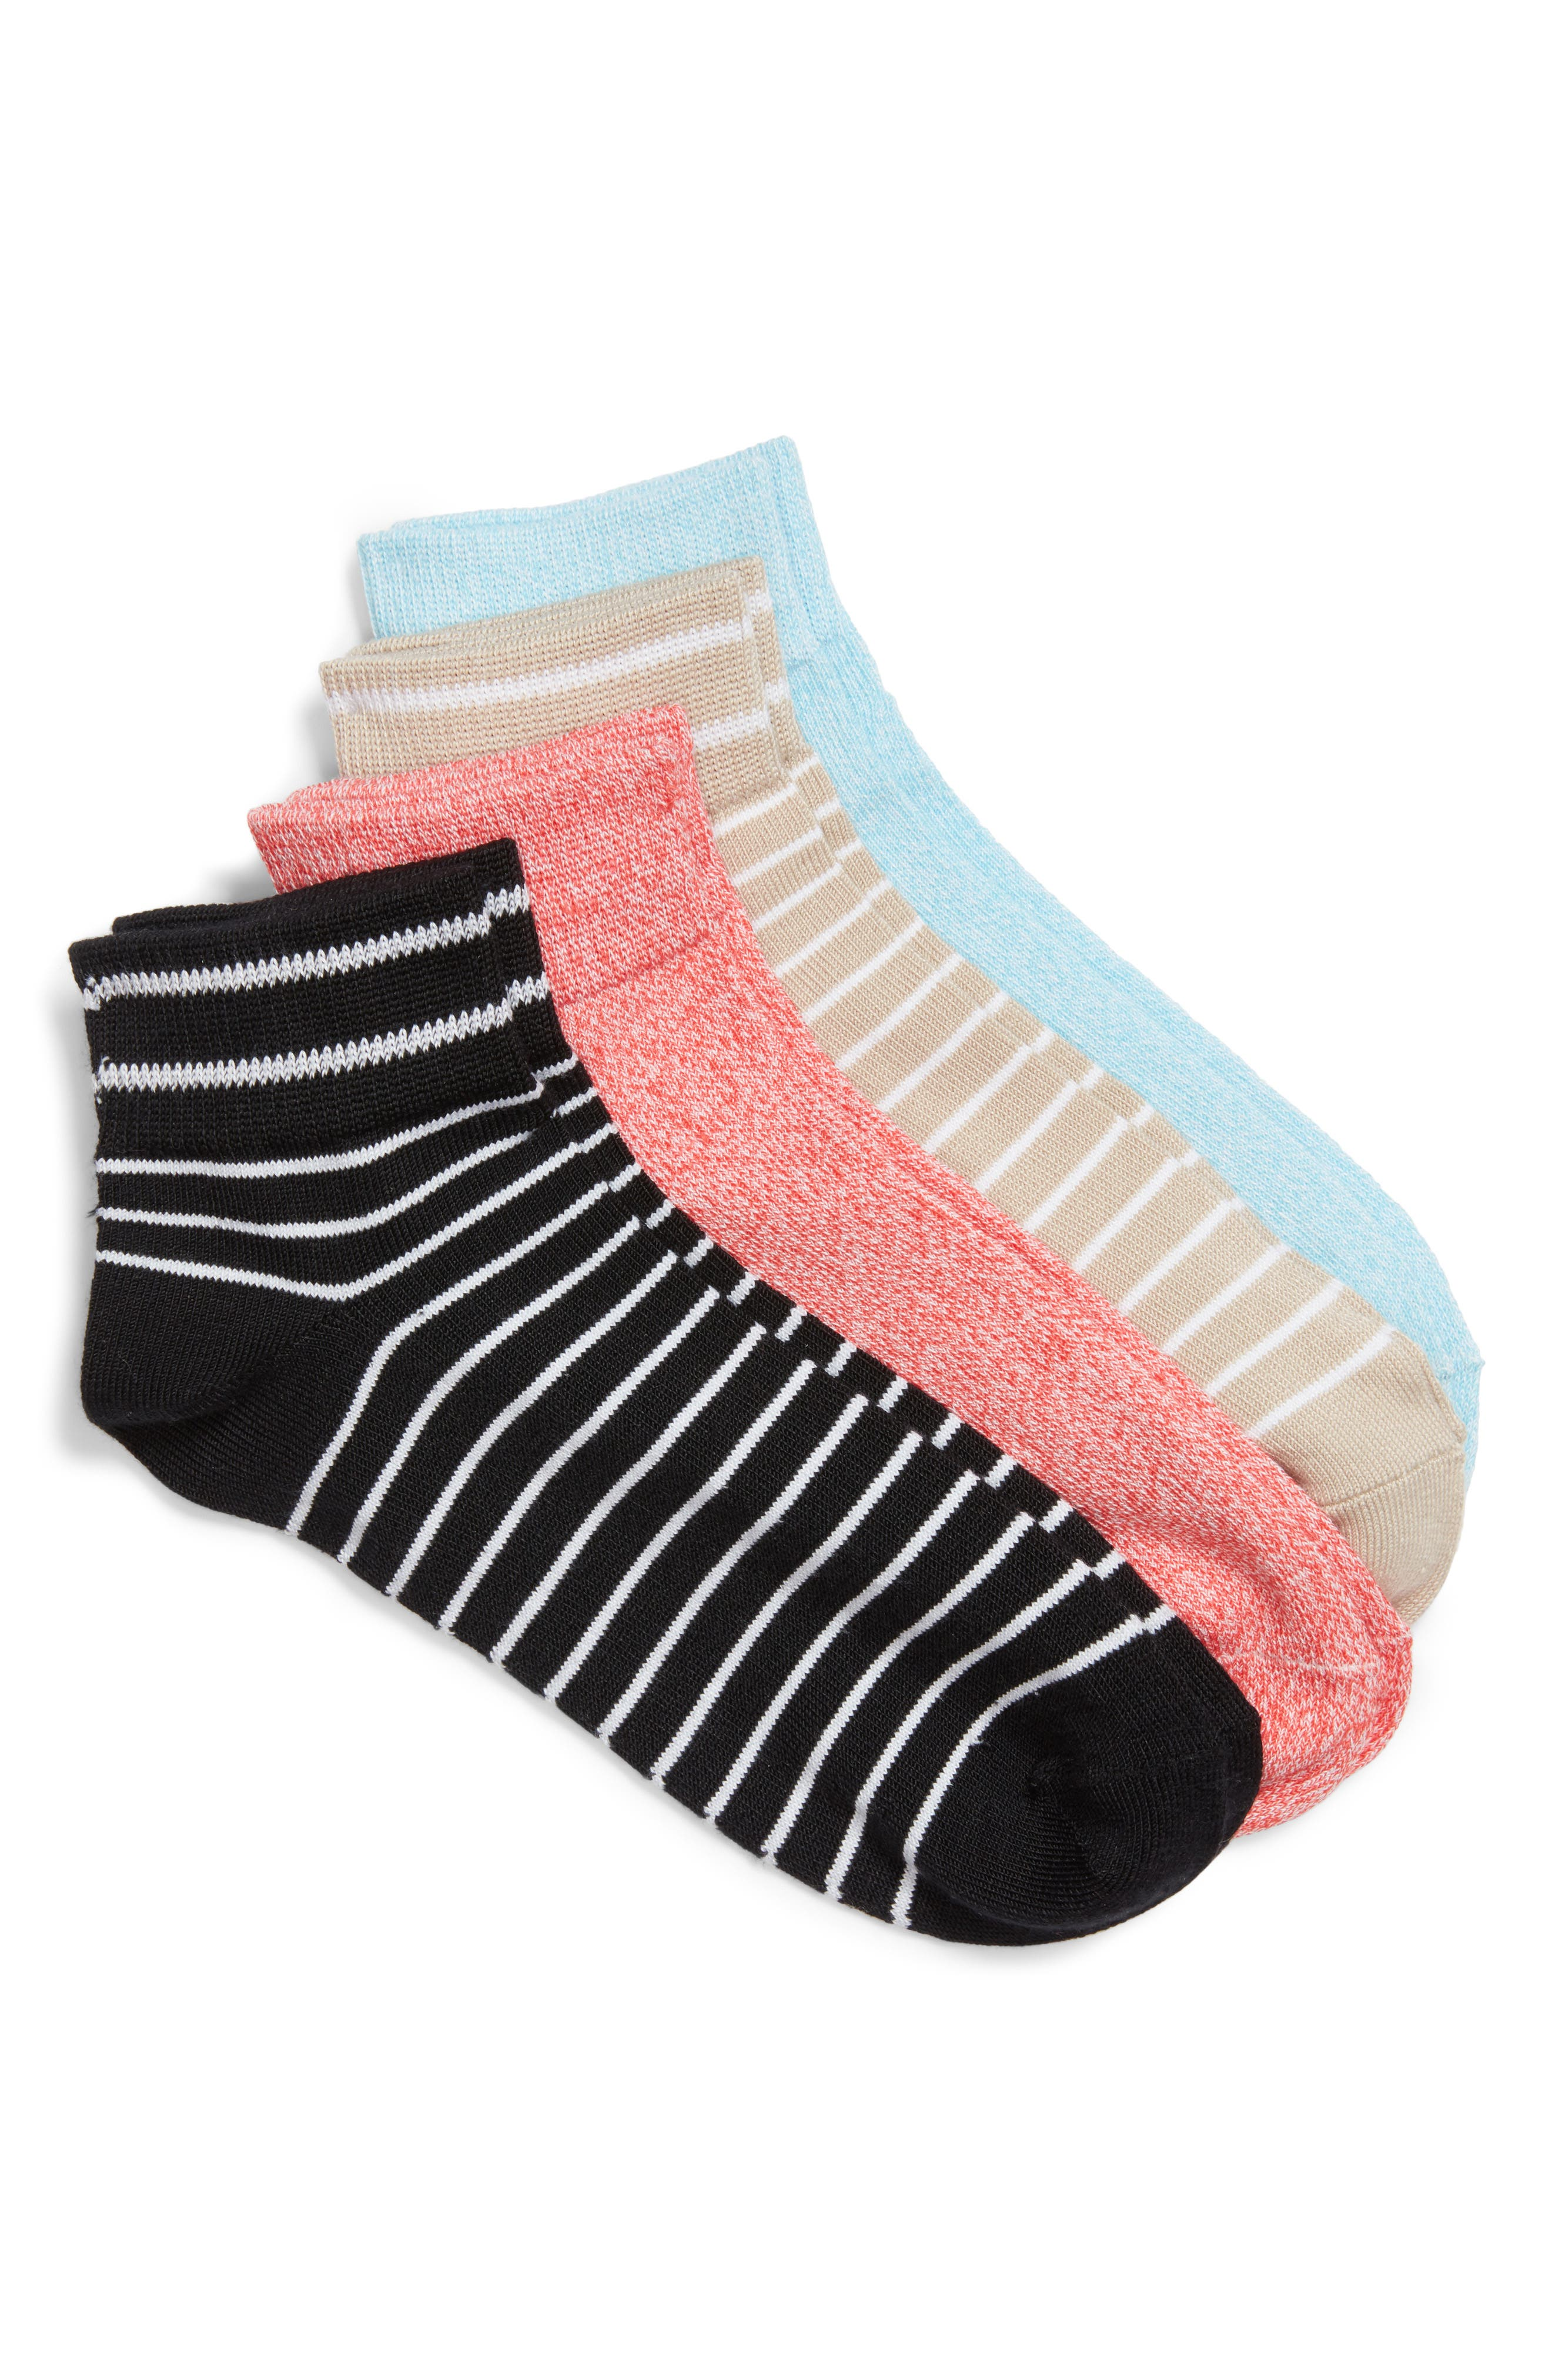 Hue 4-Pack Ankle Socks